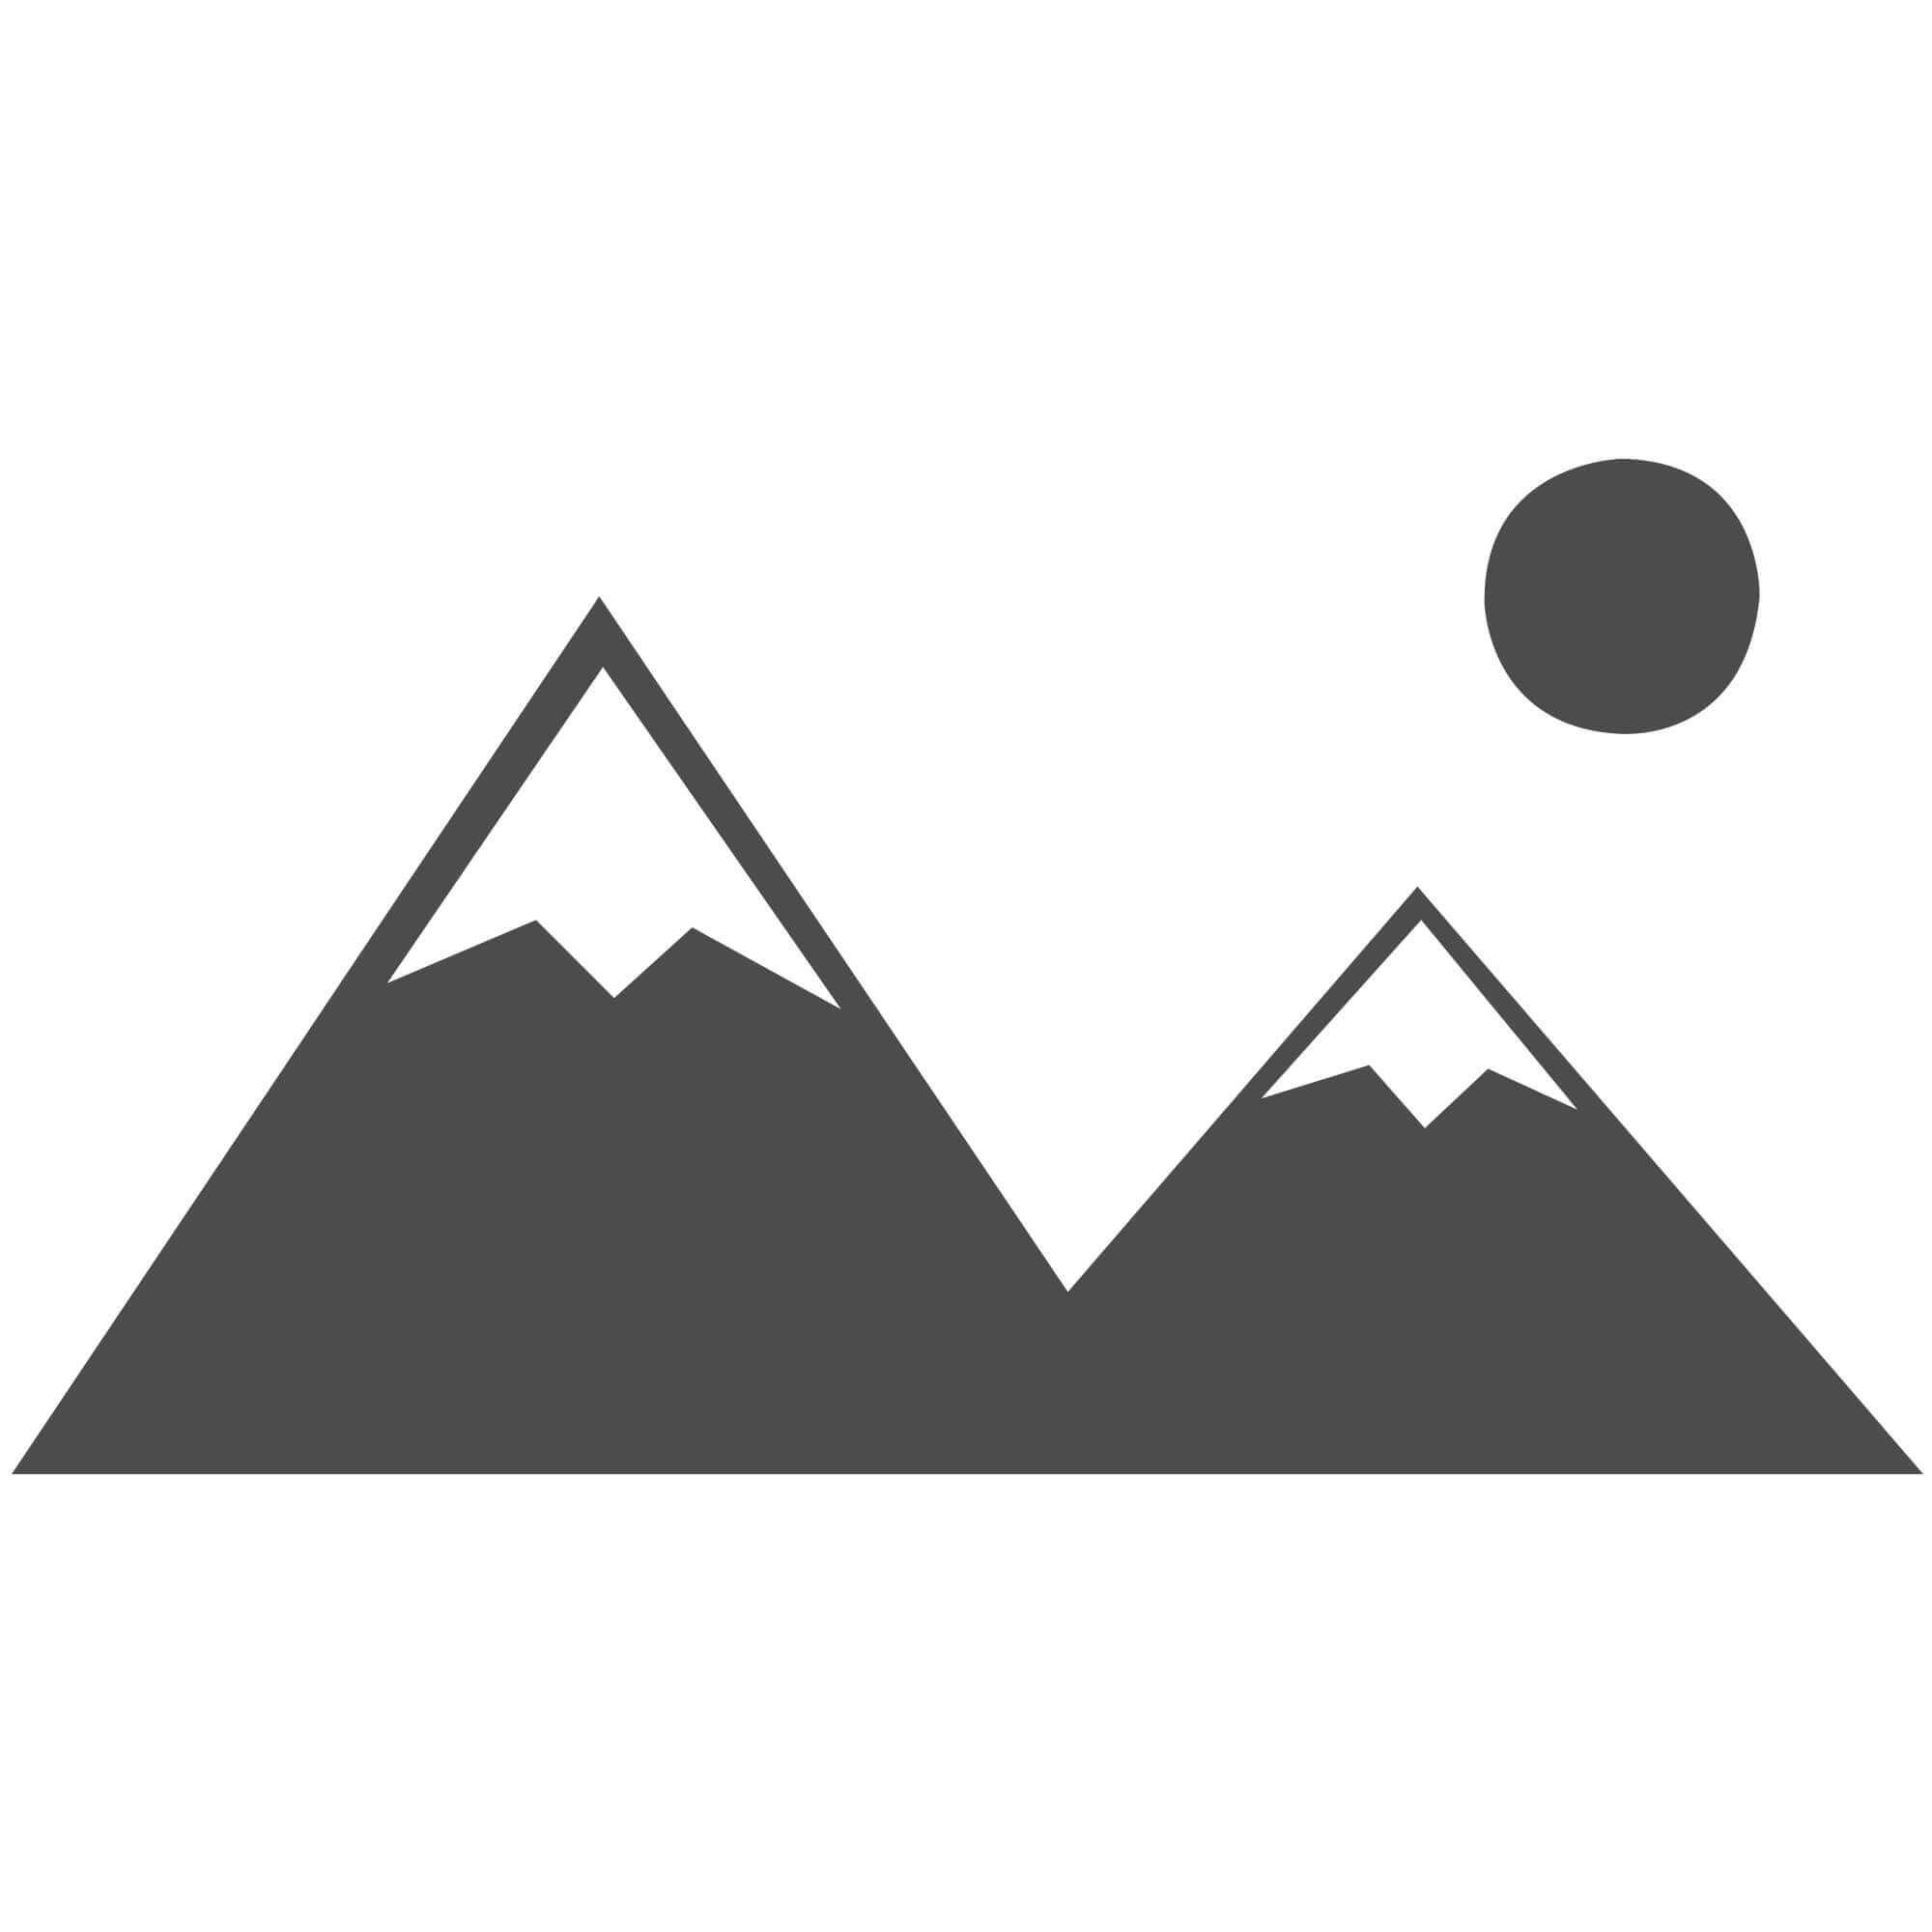 Indian Kilim Flat-weave Rug - 100 x 149 cm